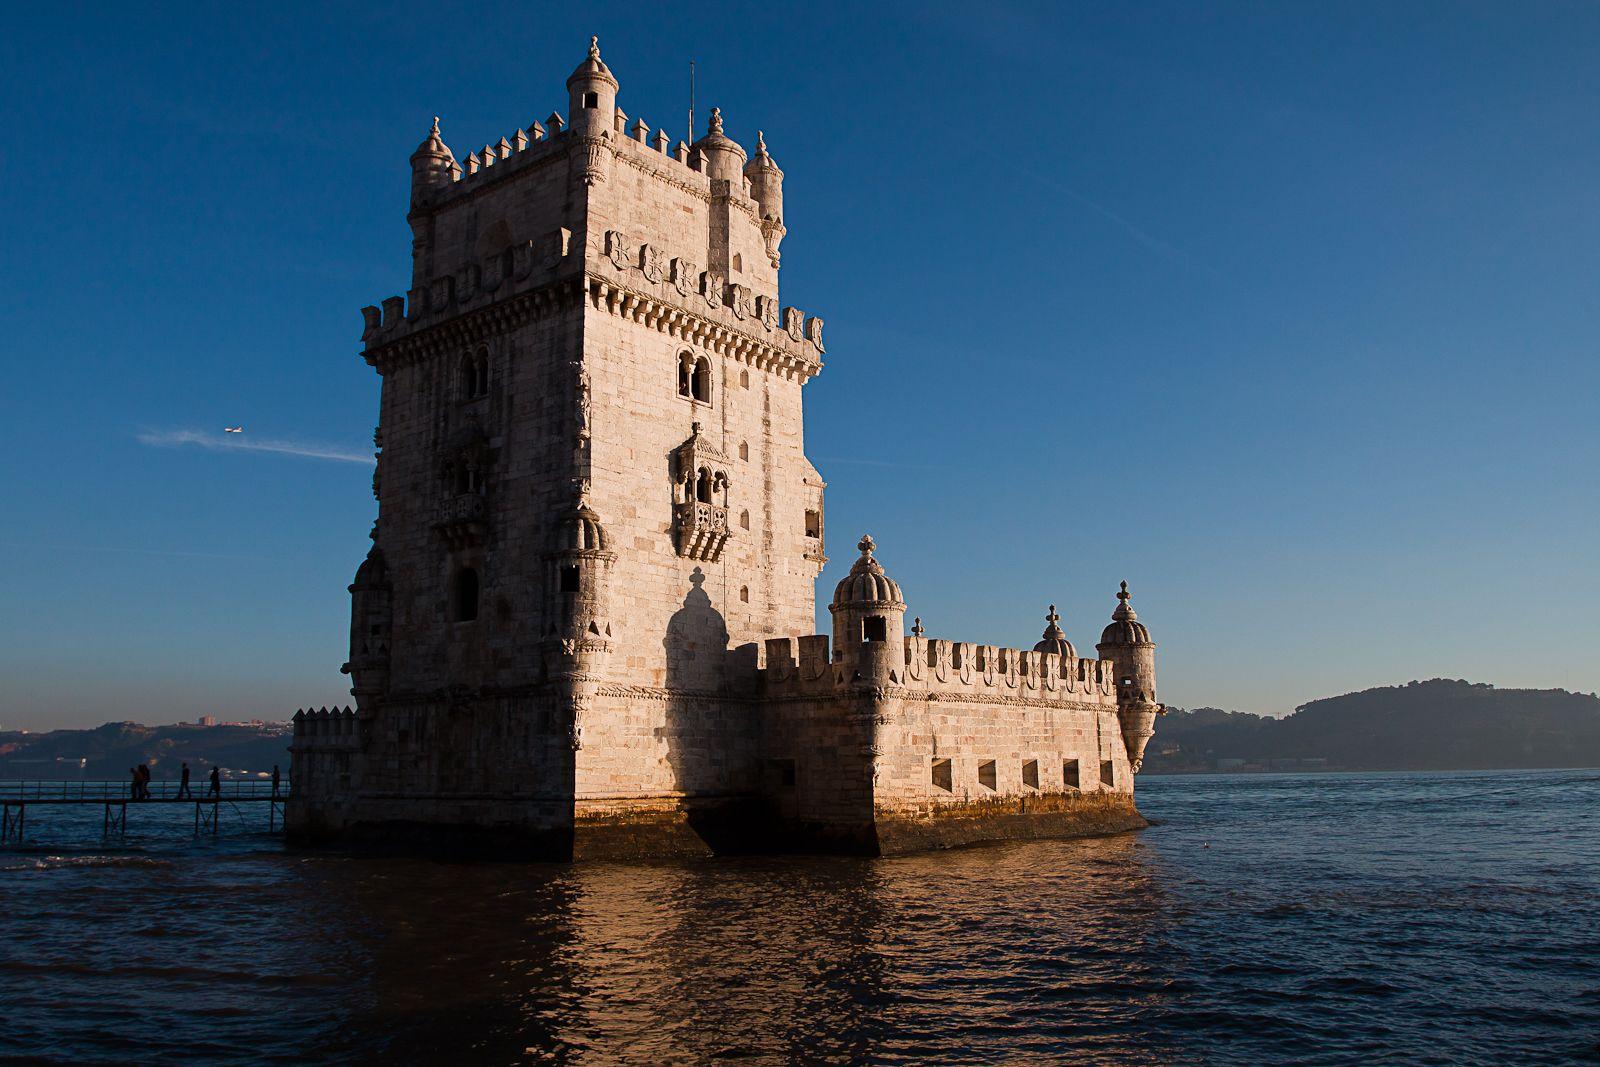 Lisbon Torre De Belem Just Reminds Me The Age Of Exploration Places To Visit Lisbon Portugal Travel